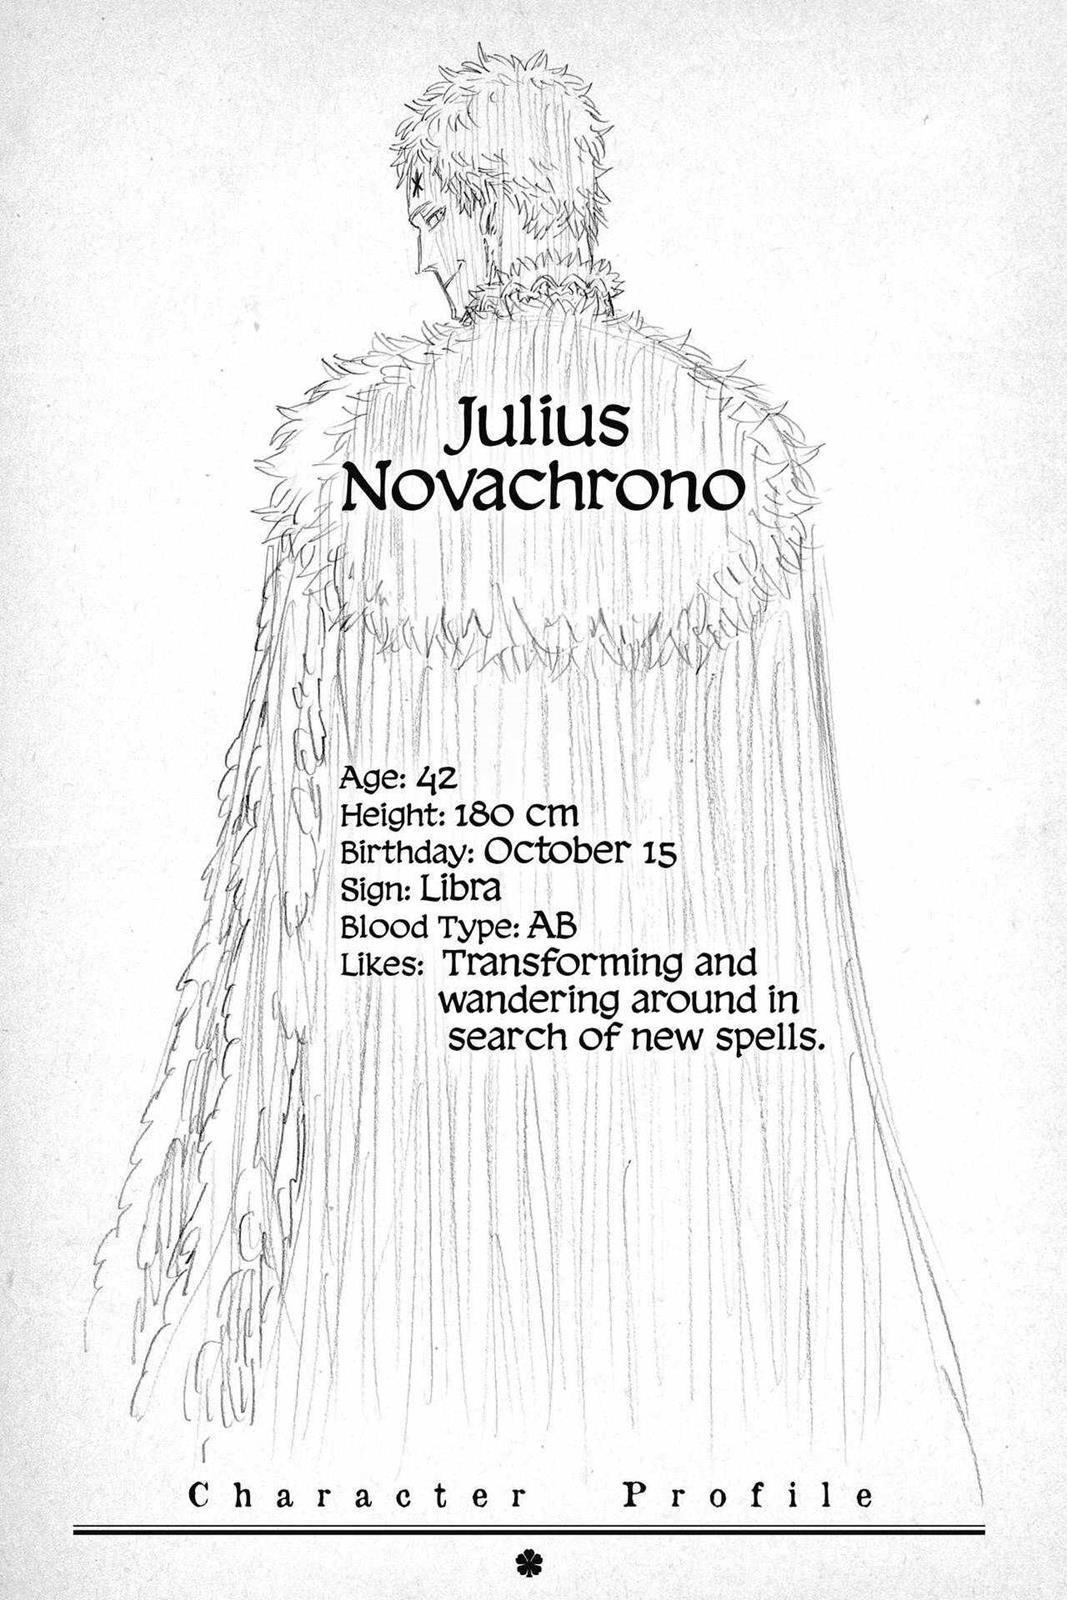 Julius Novachrono Black Clover Anime Clover Black Your power is a bit little. pinterest